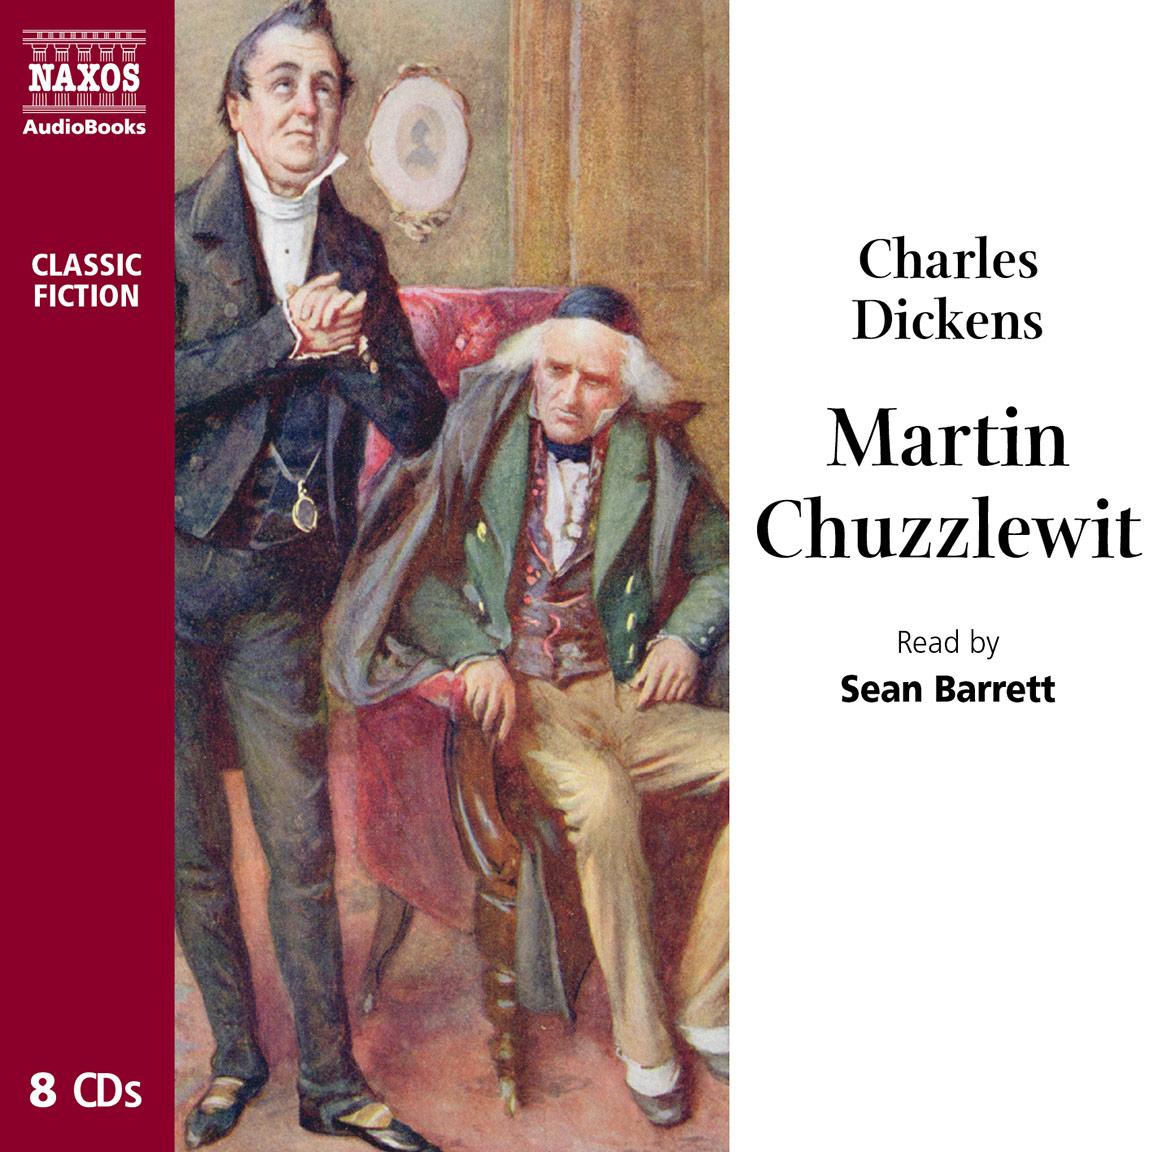 Martin Chuzzlewit (abridged)